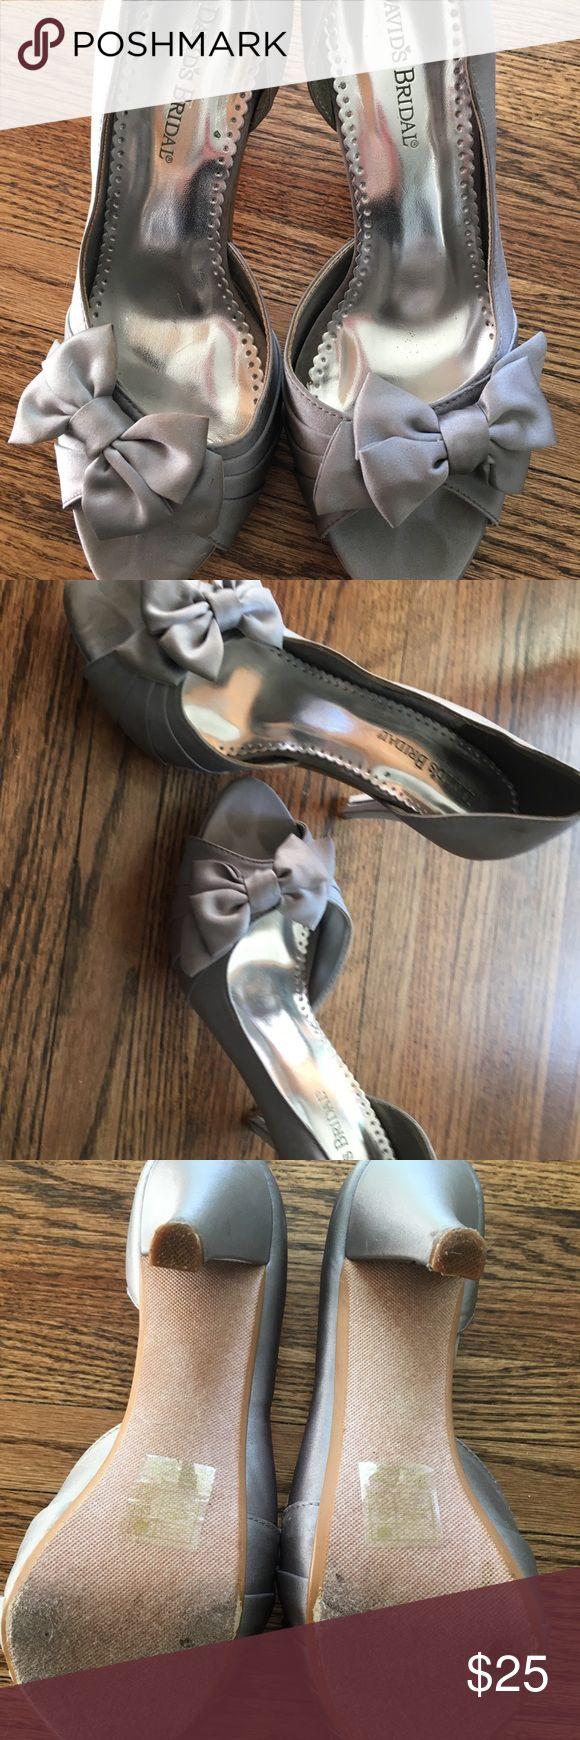 David's Bridal Satin Peep Toe, Maribelle heels 8.5 David's bridal Maribelle heels. Davids bridal color- mercury. Worn once. Good condition David's Bridal Shoes Heels